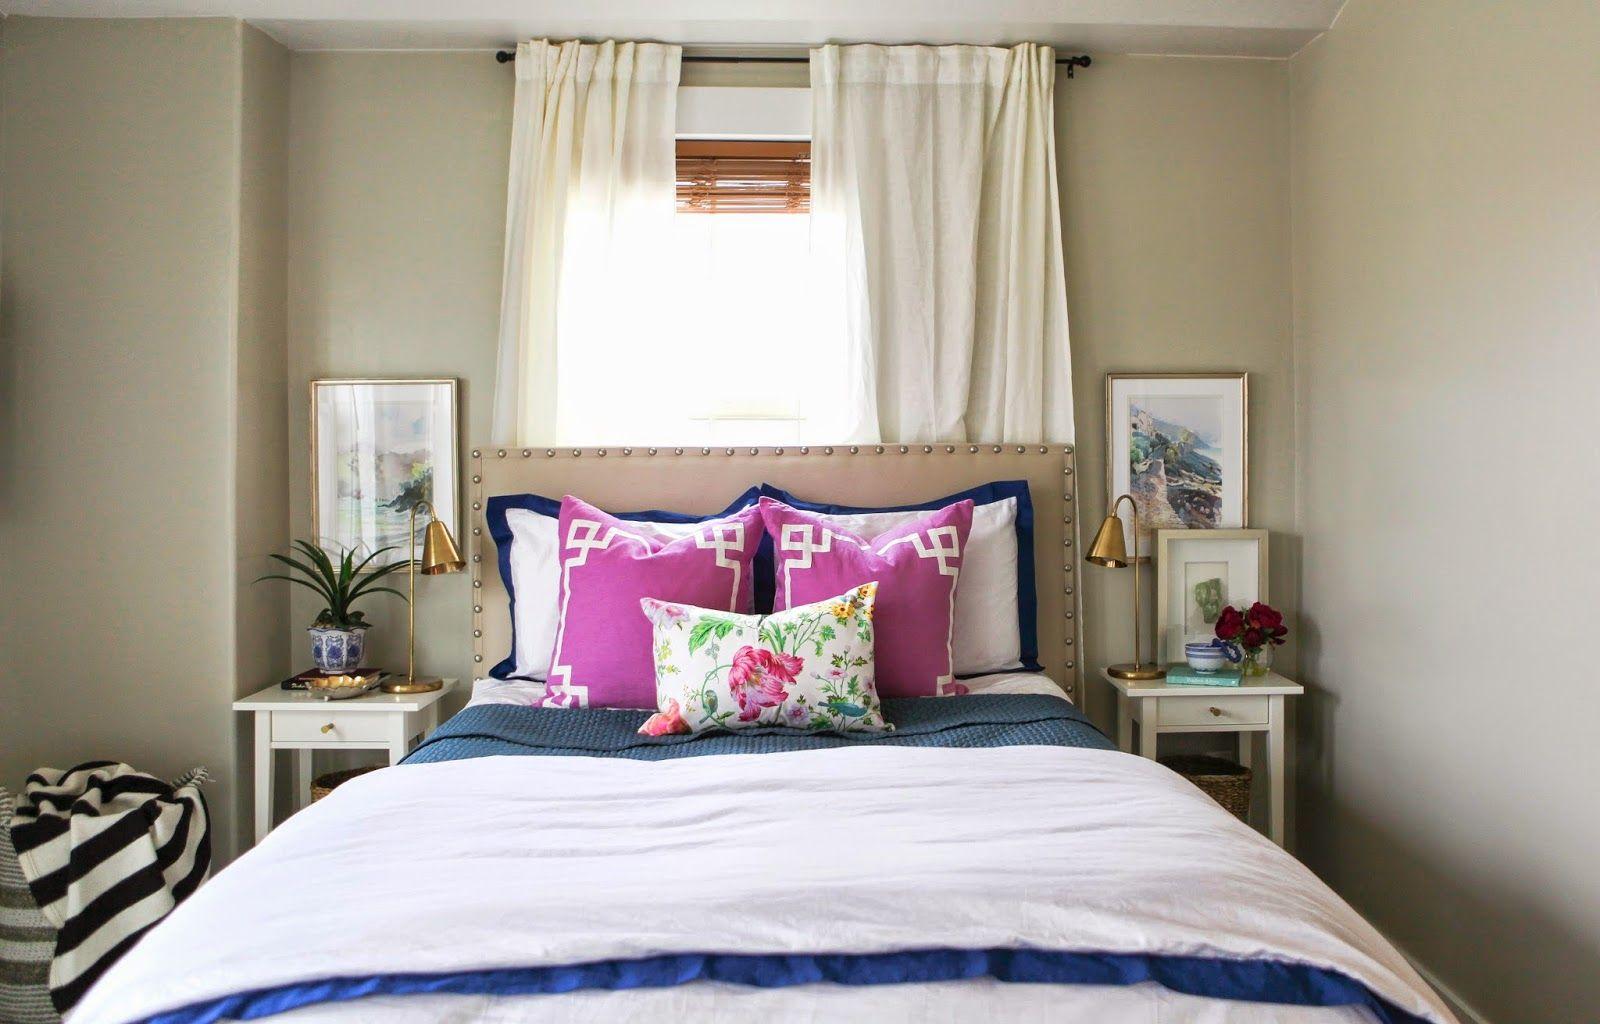 6th Street Design School: A Master Bedroom Refresh